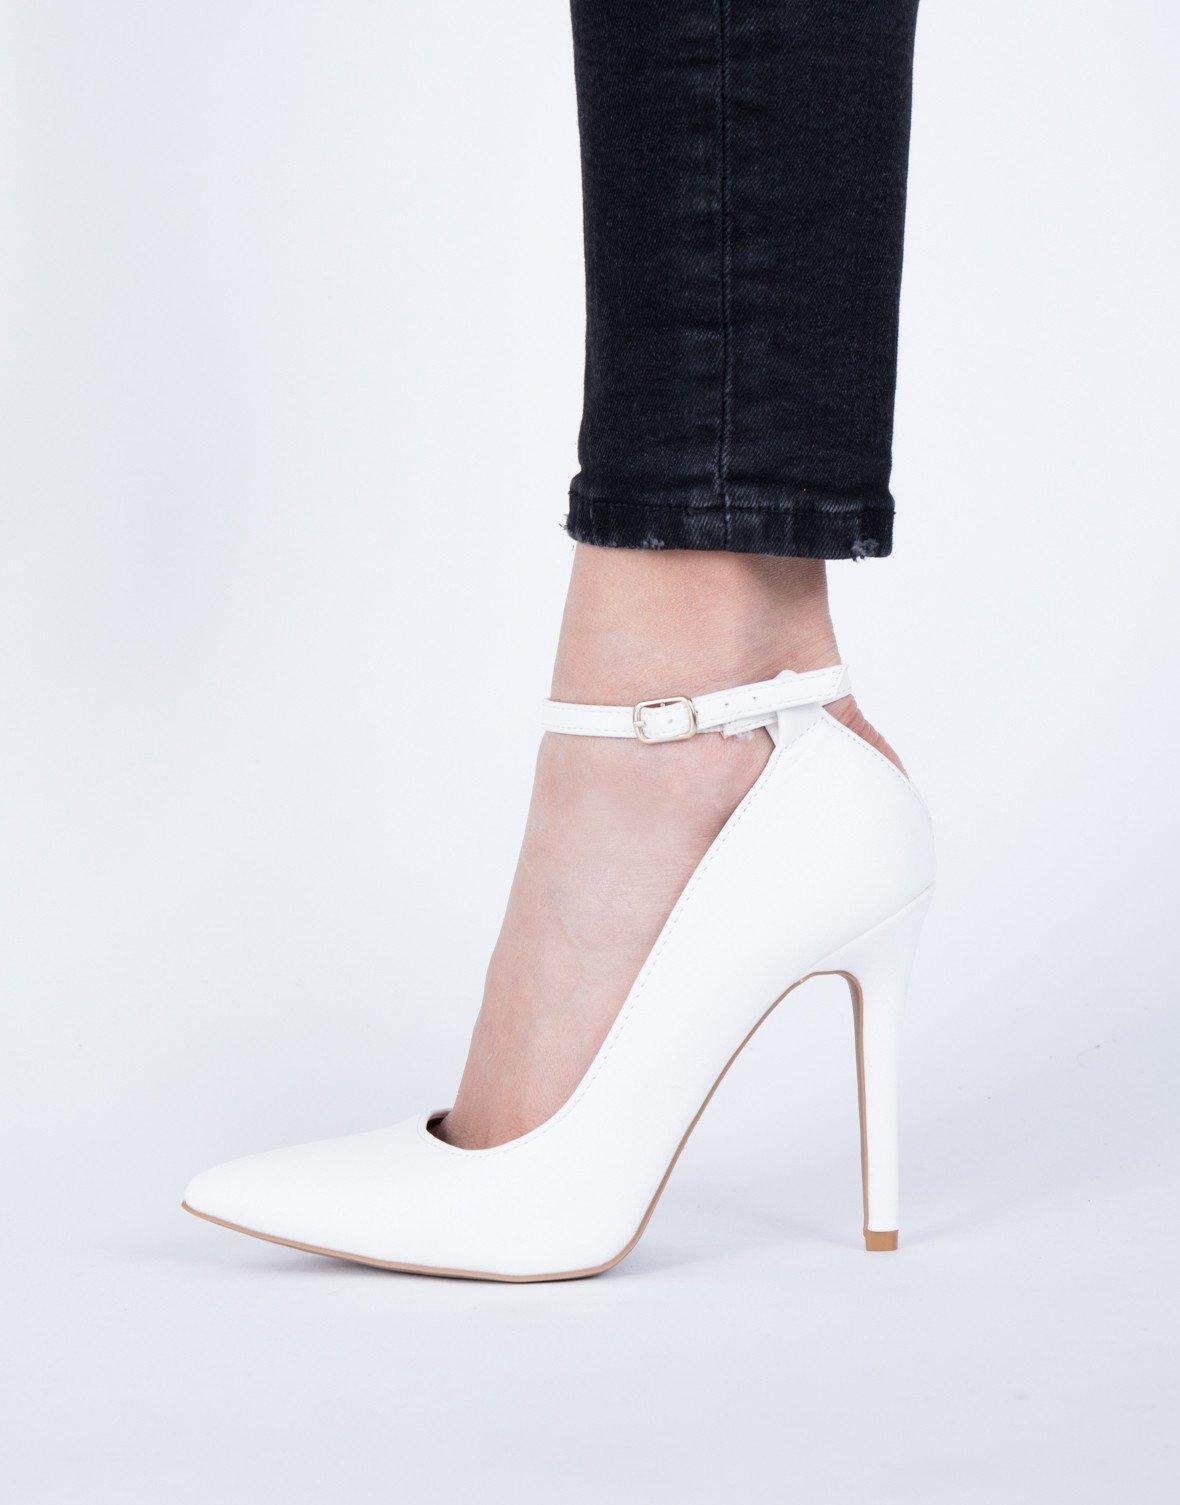 Pin on Heels